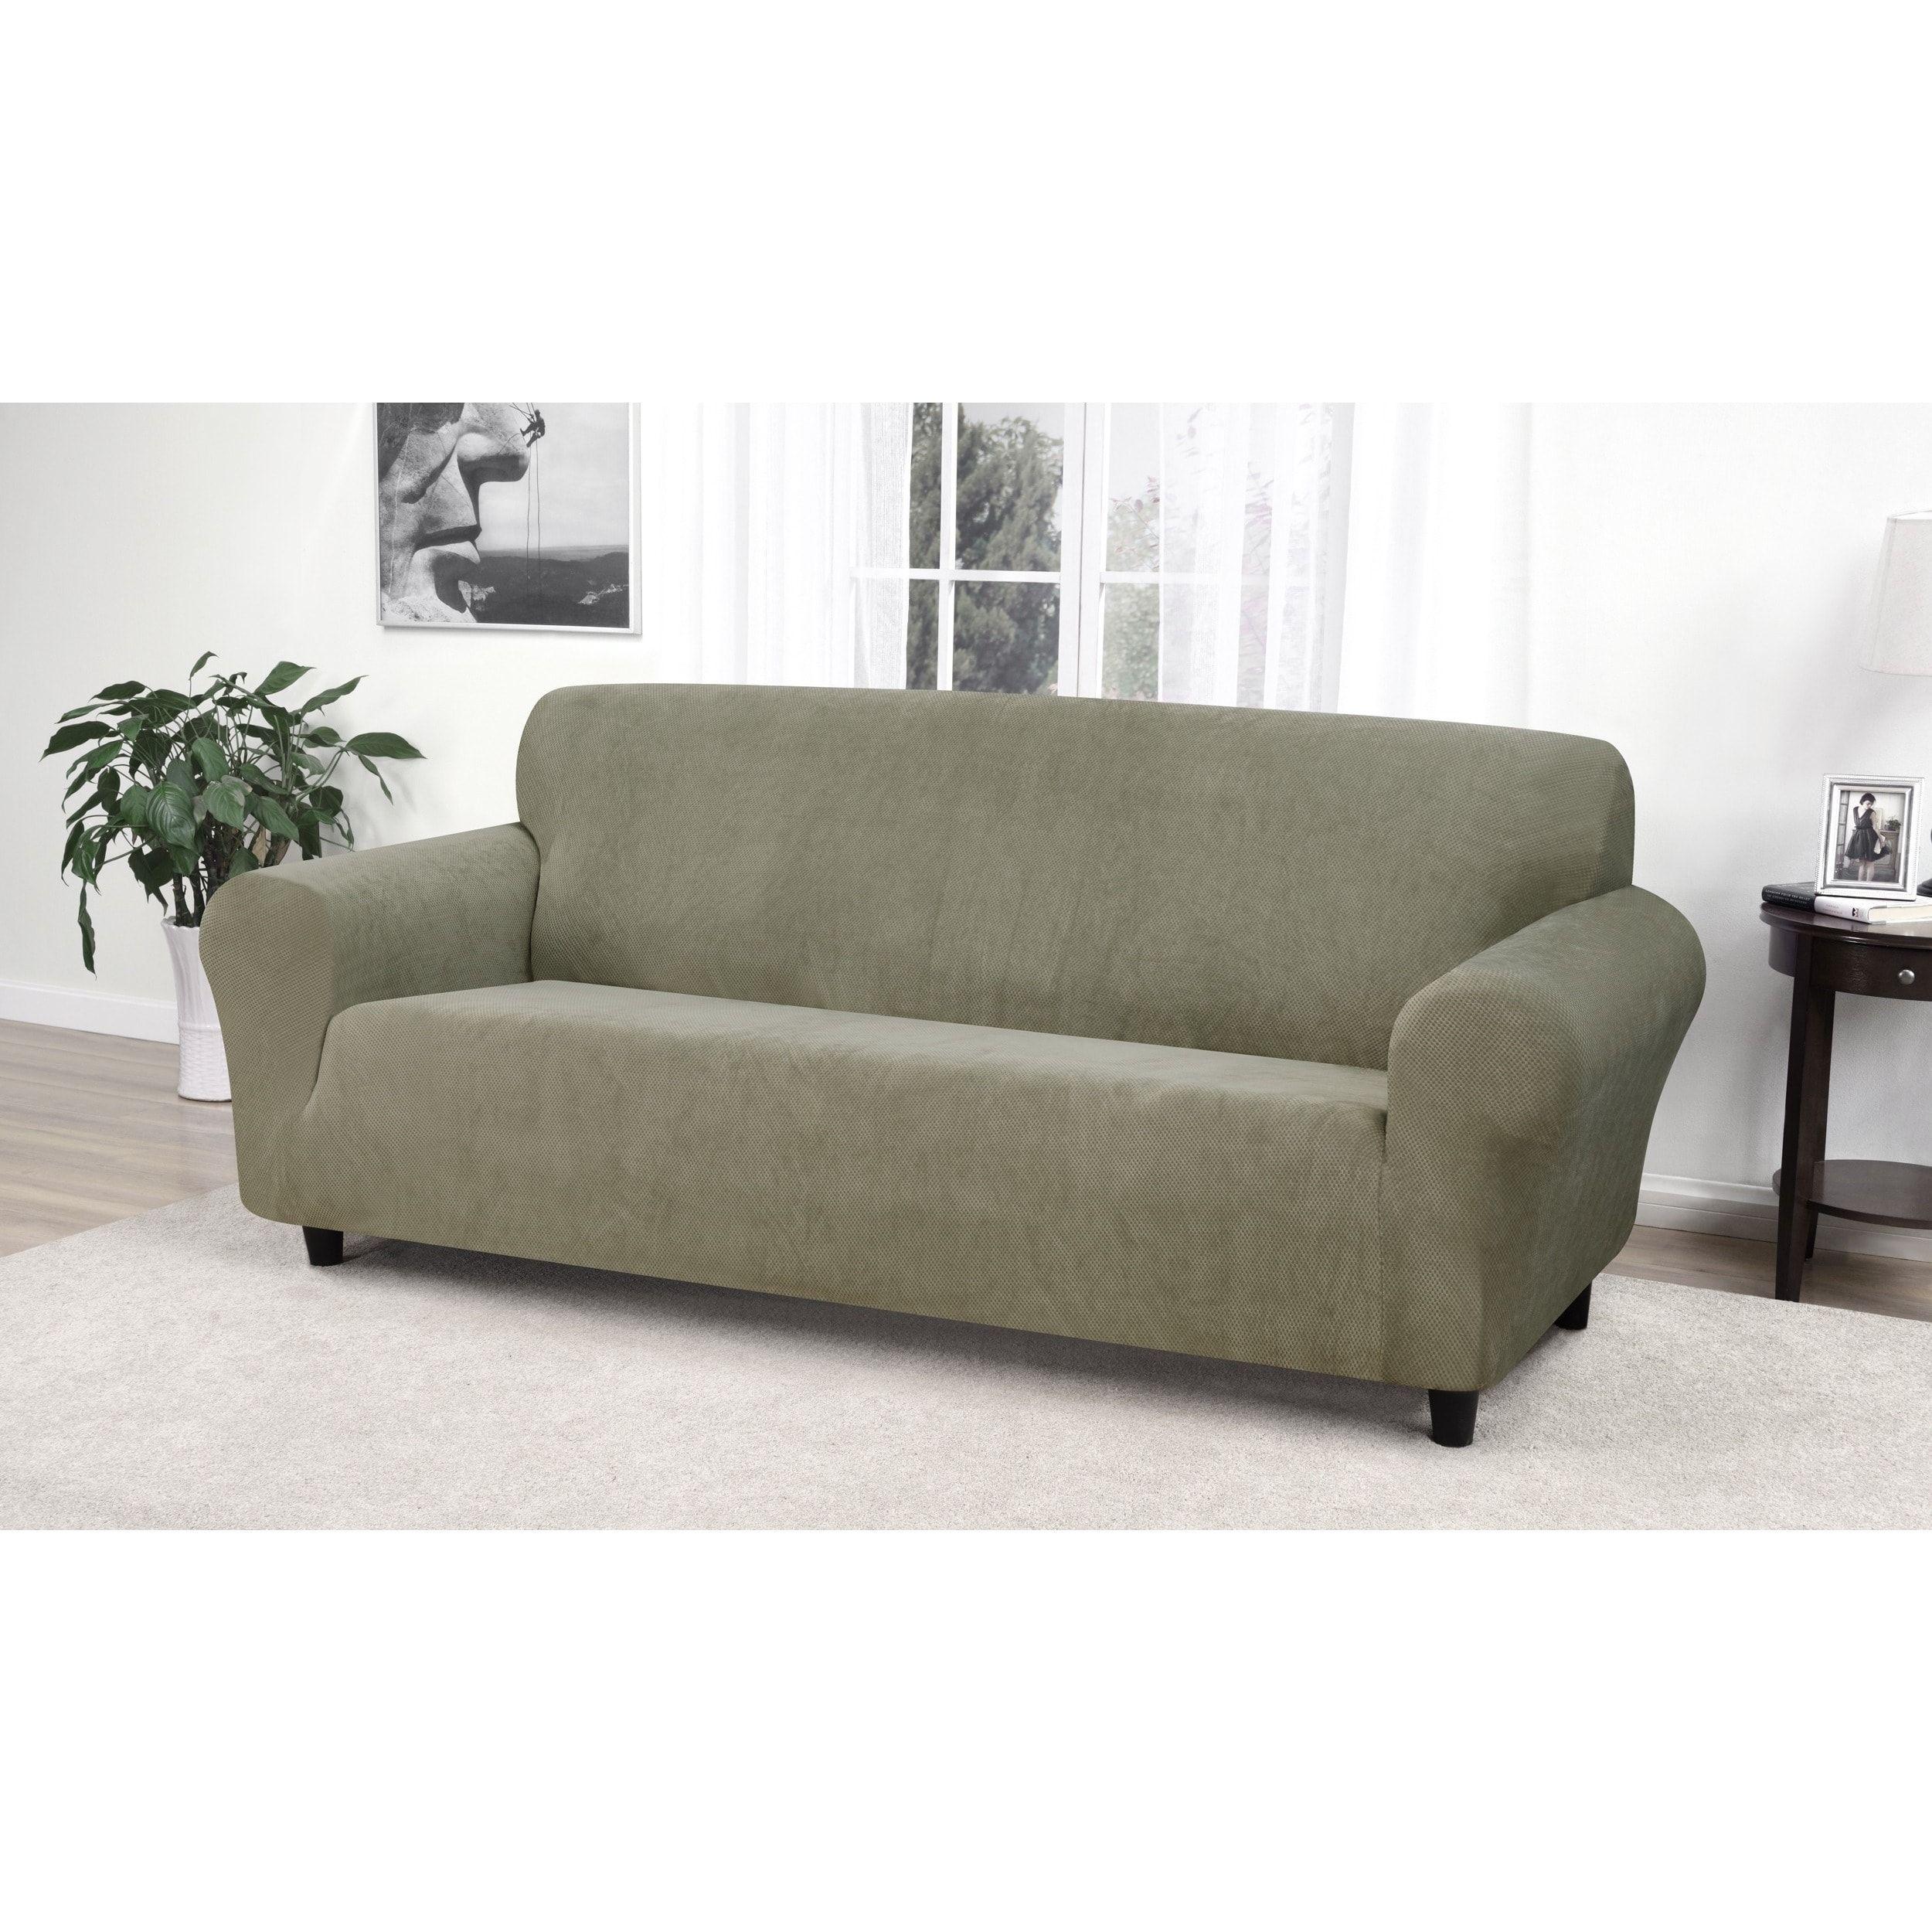 Kathy ireland day break sofa slipcover beige products